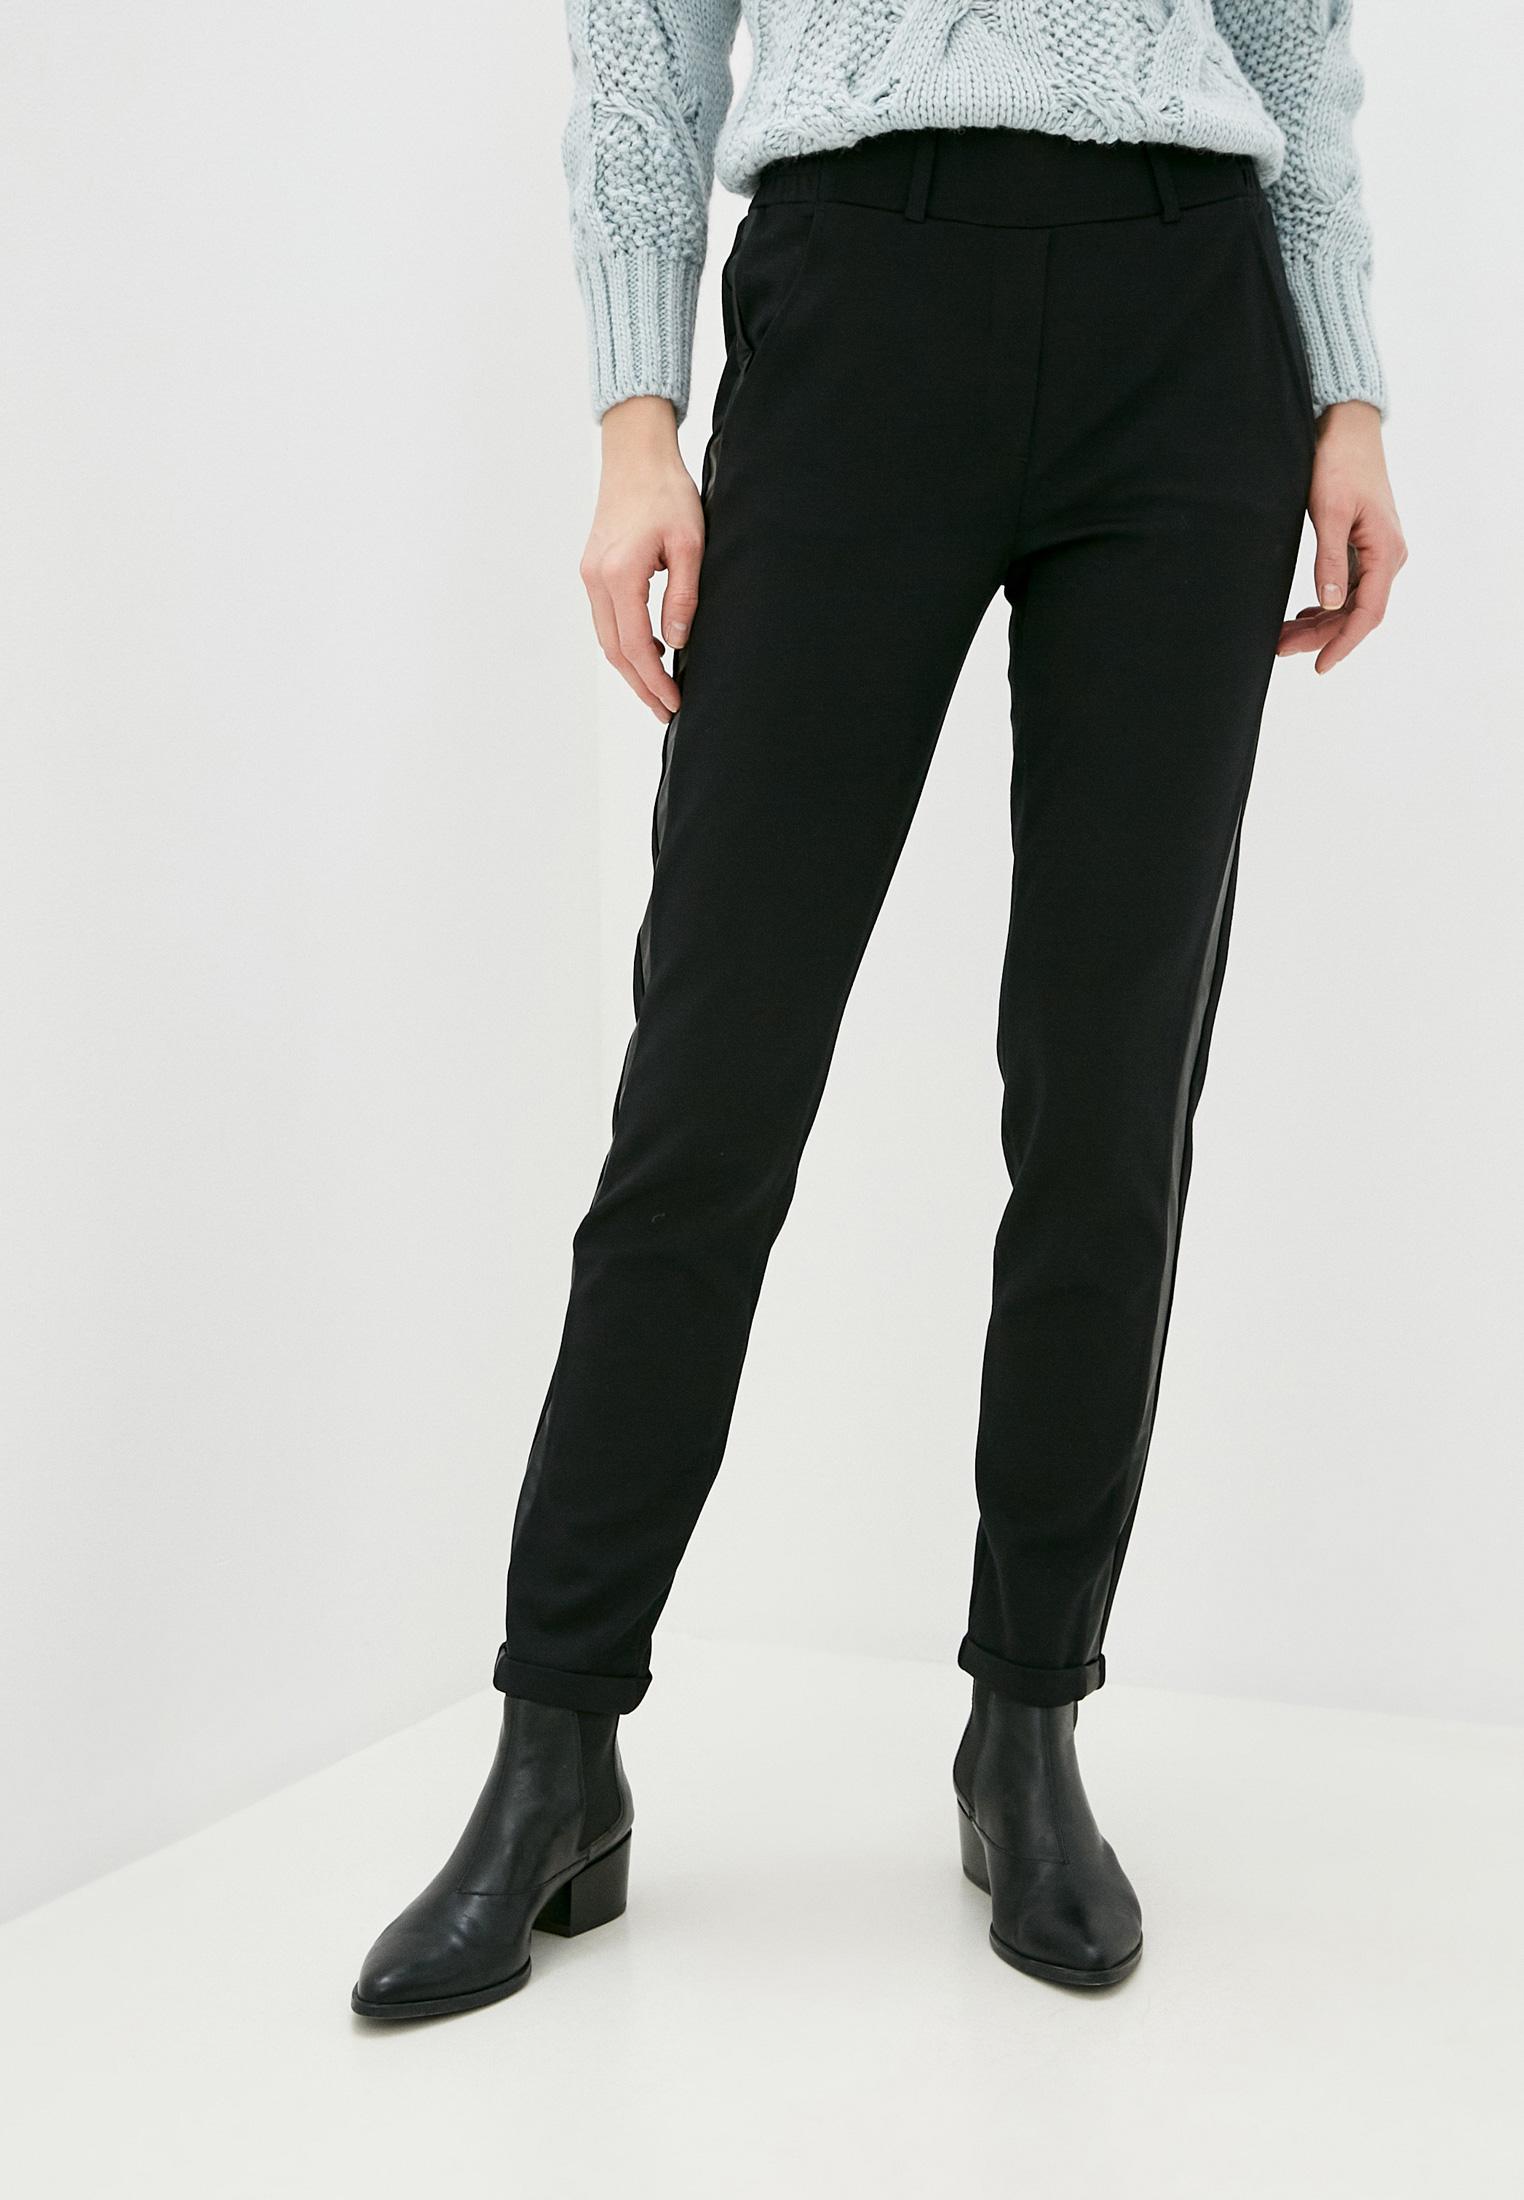 Женские прямые брюки Betty Barclay 6357/1069